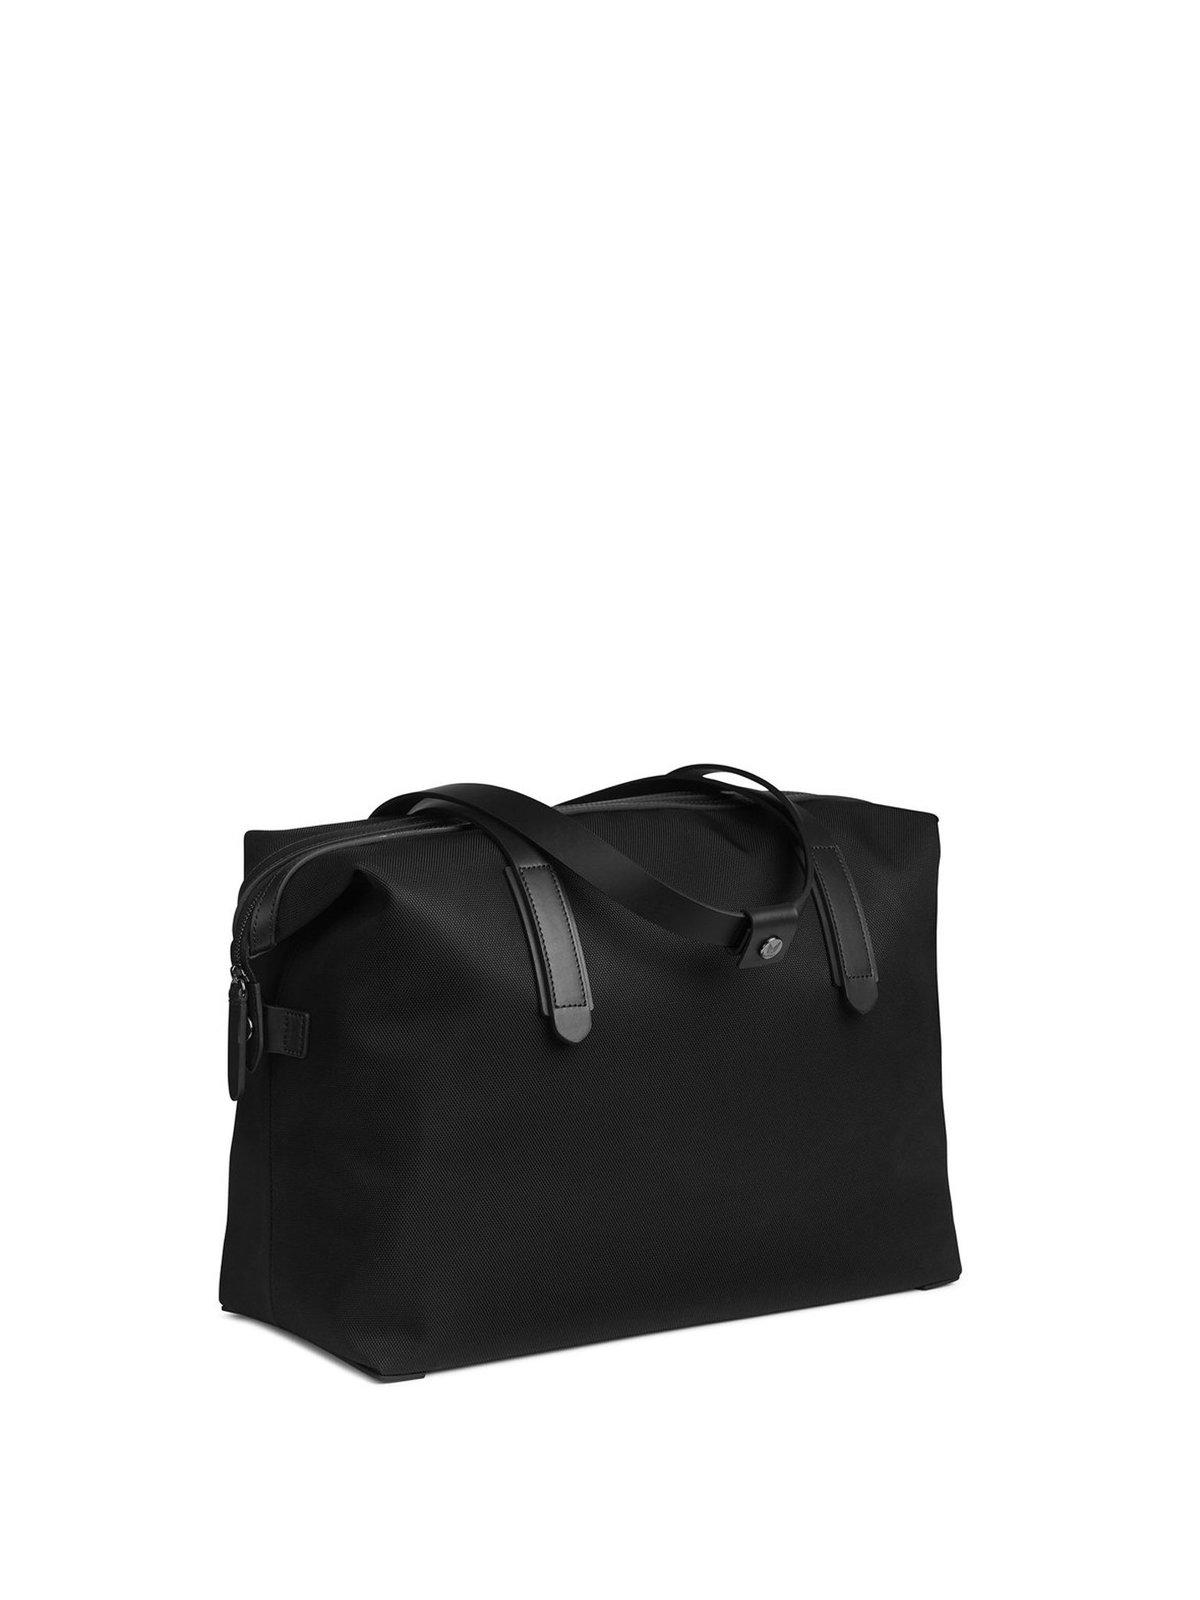 Mismo MS Weekend Bag  522b6a2bf2b0c